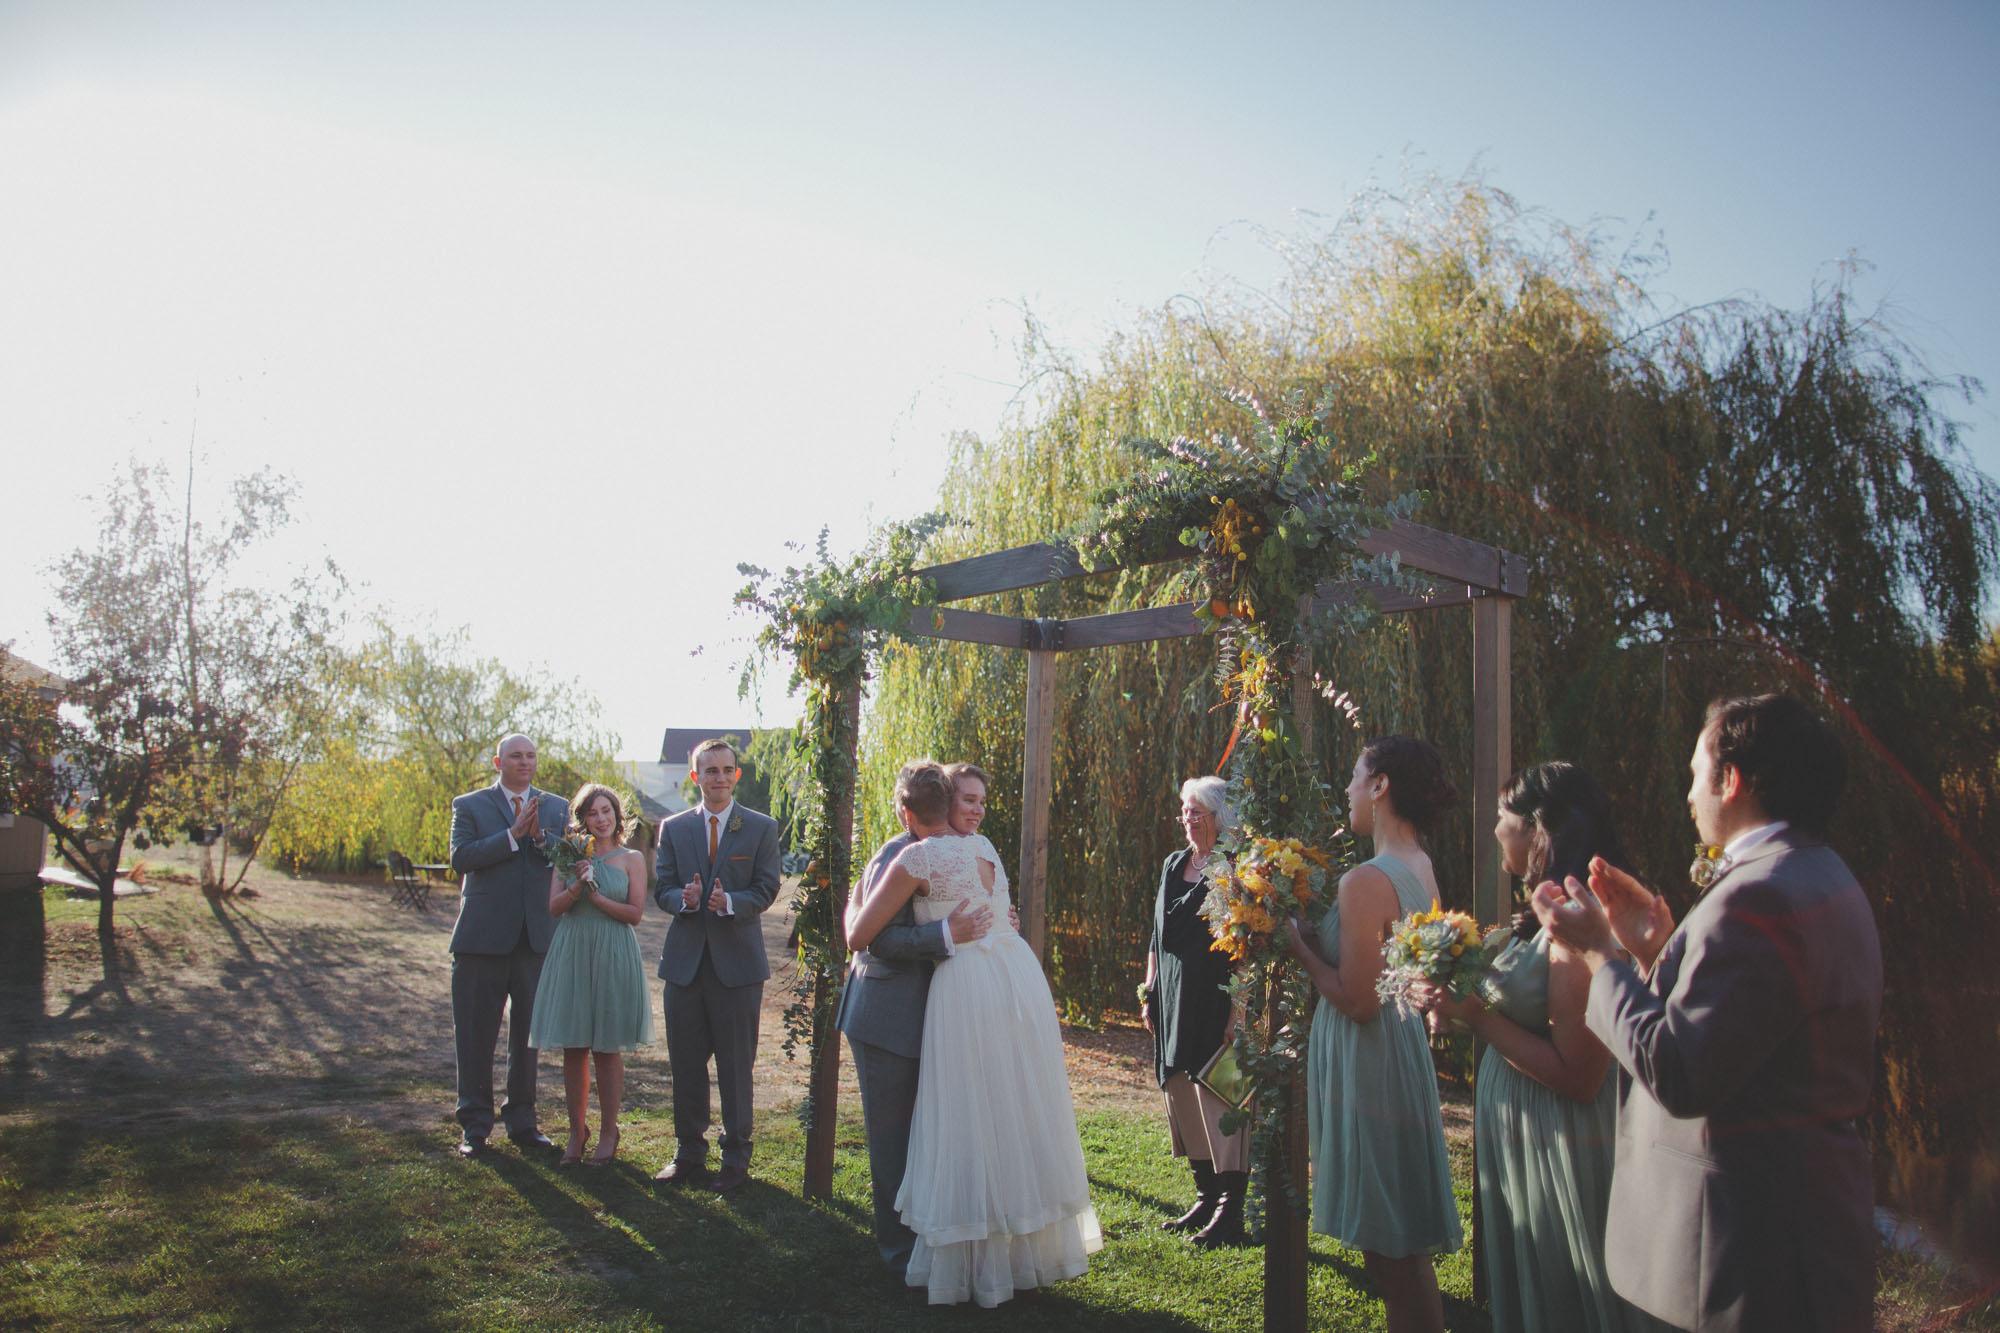 Gretchen_Gause_Petaluma_Olympias_Valley_Wedding_Photo-314.jpg